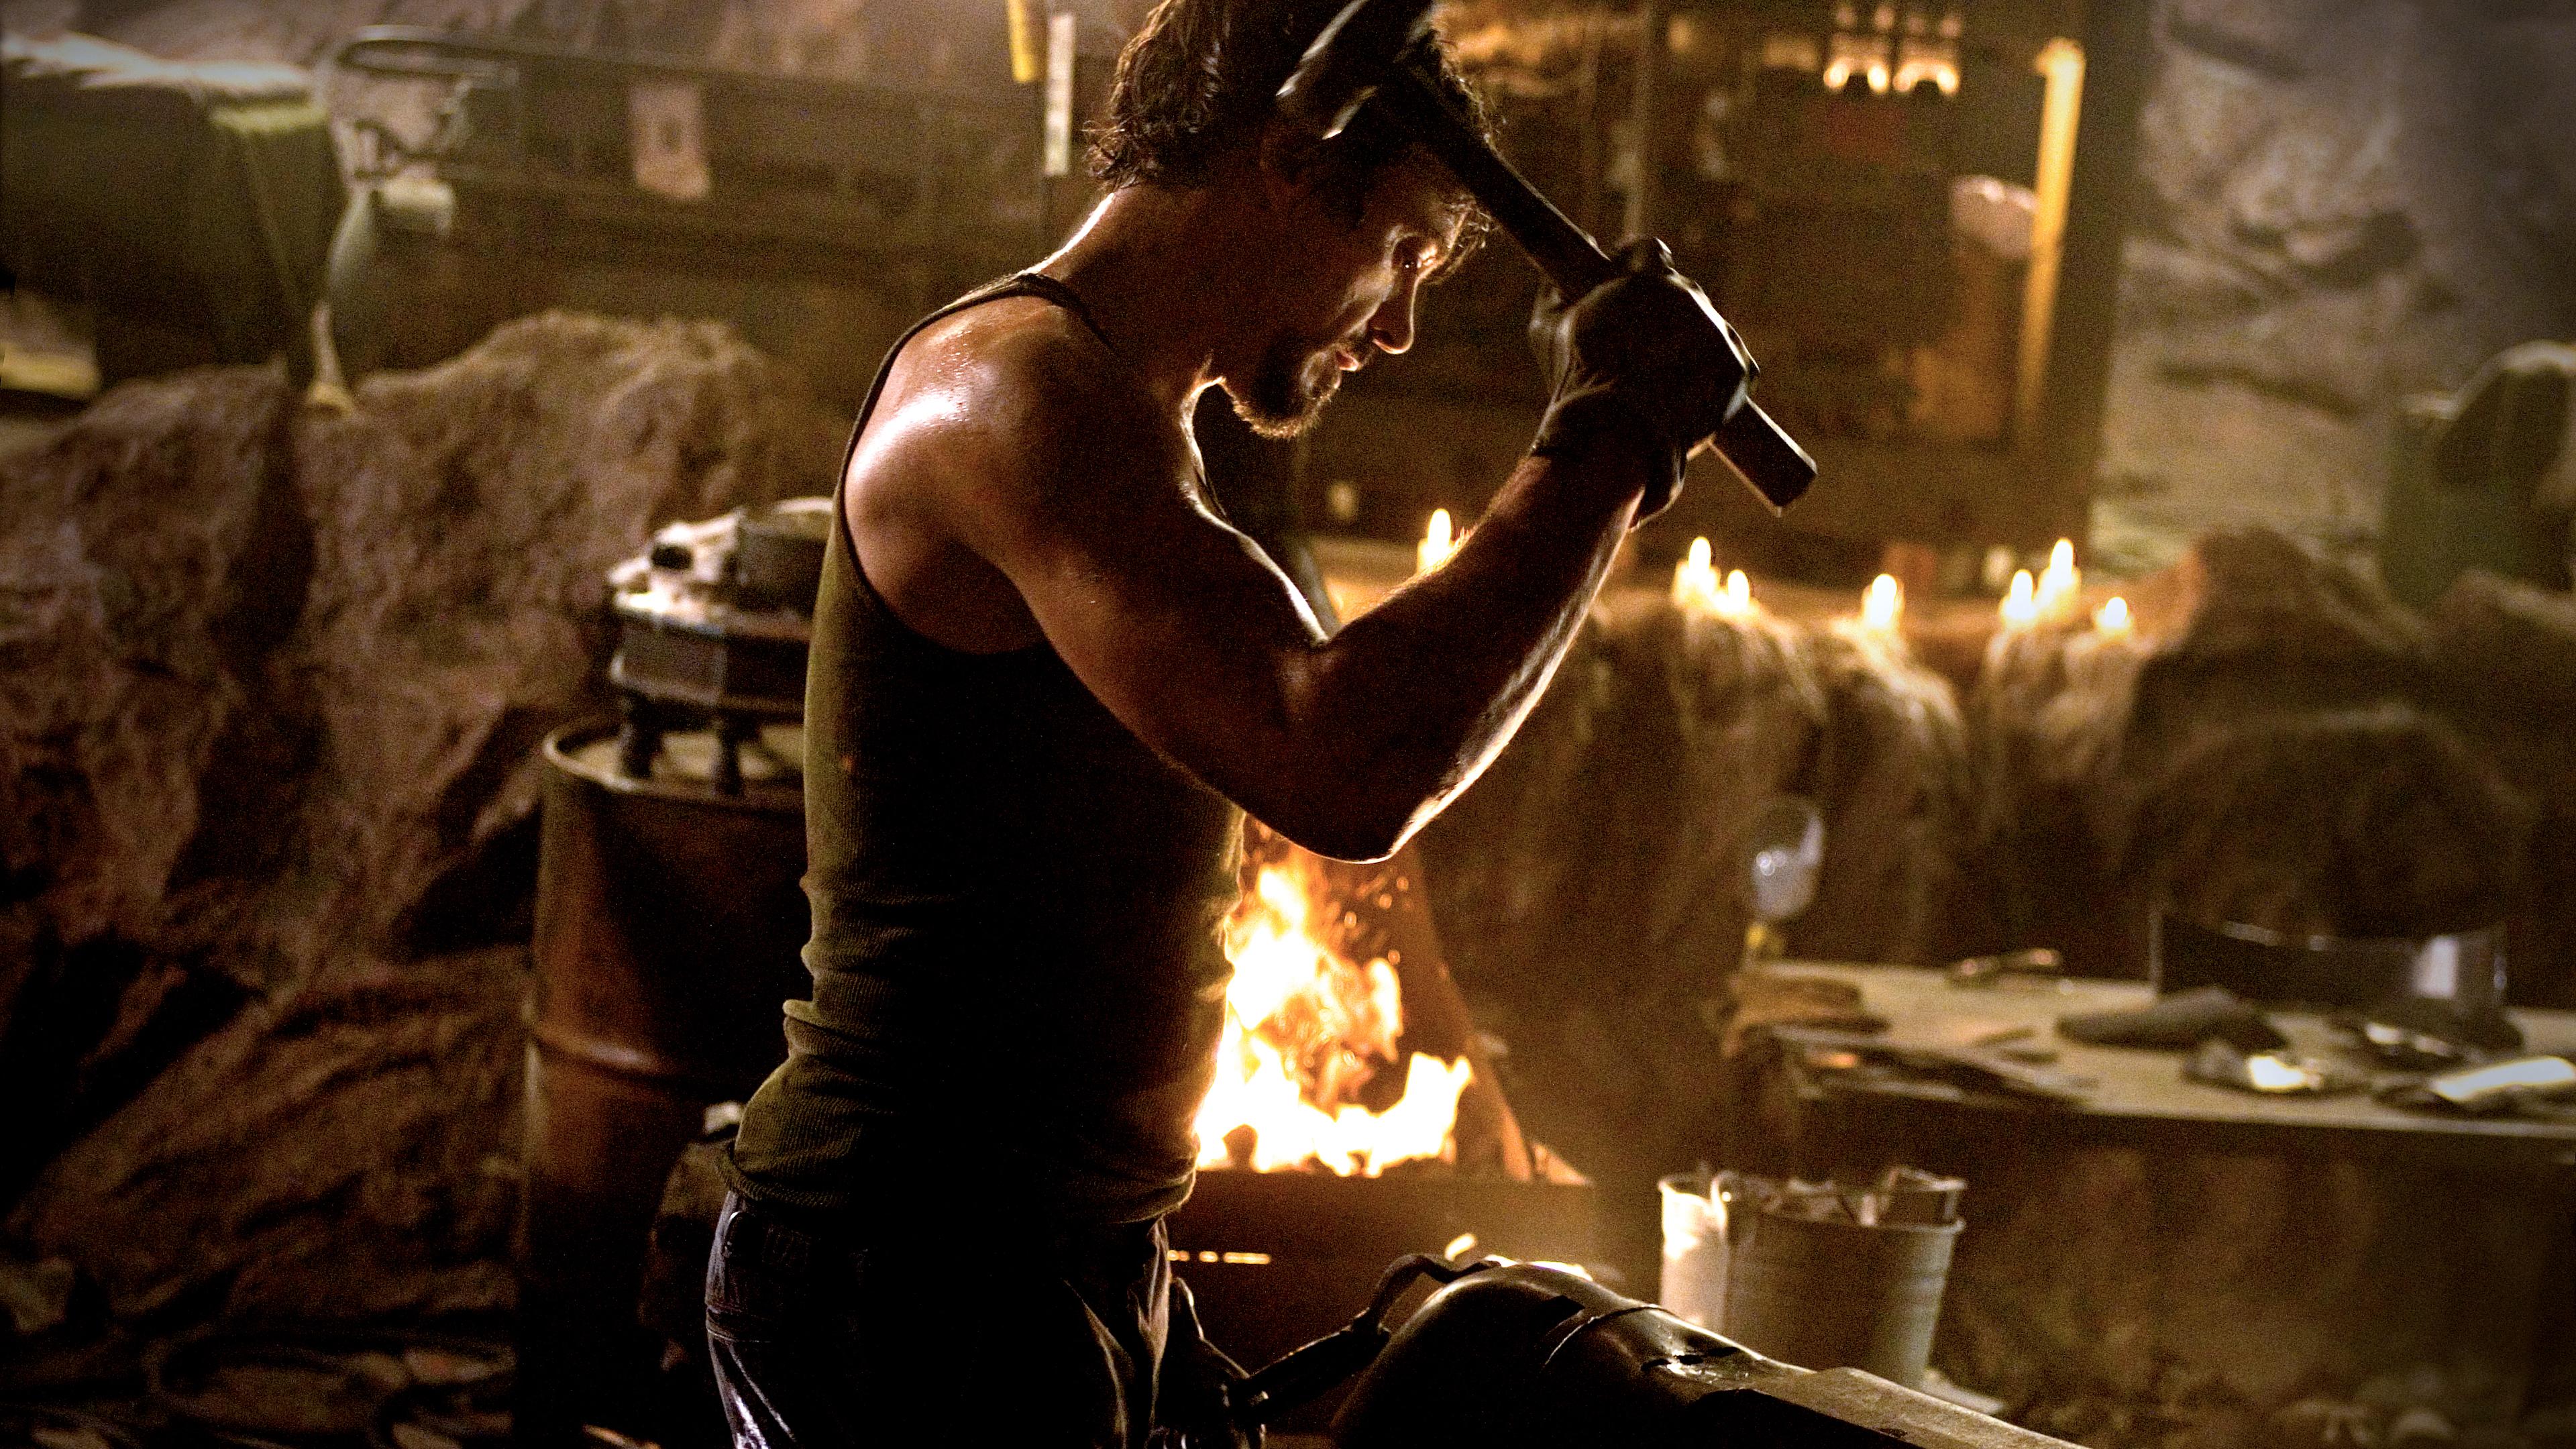 tony stark in the cave 1541294212 - Tony Stark In The Cave - superheroes wallpapers, male celebrities wallpapers, iron man wallpapers, hd-wallpapers, boys wallpapers, 5k wallpapers, 4k-wallpapers